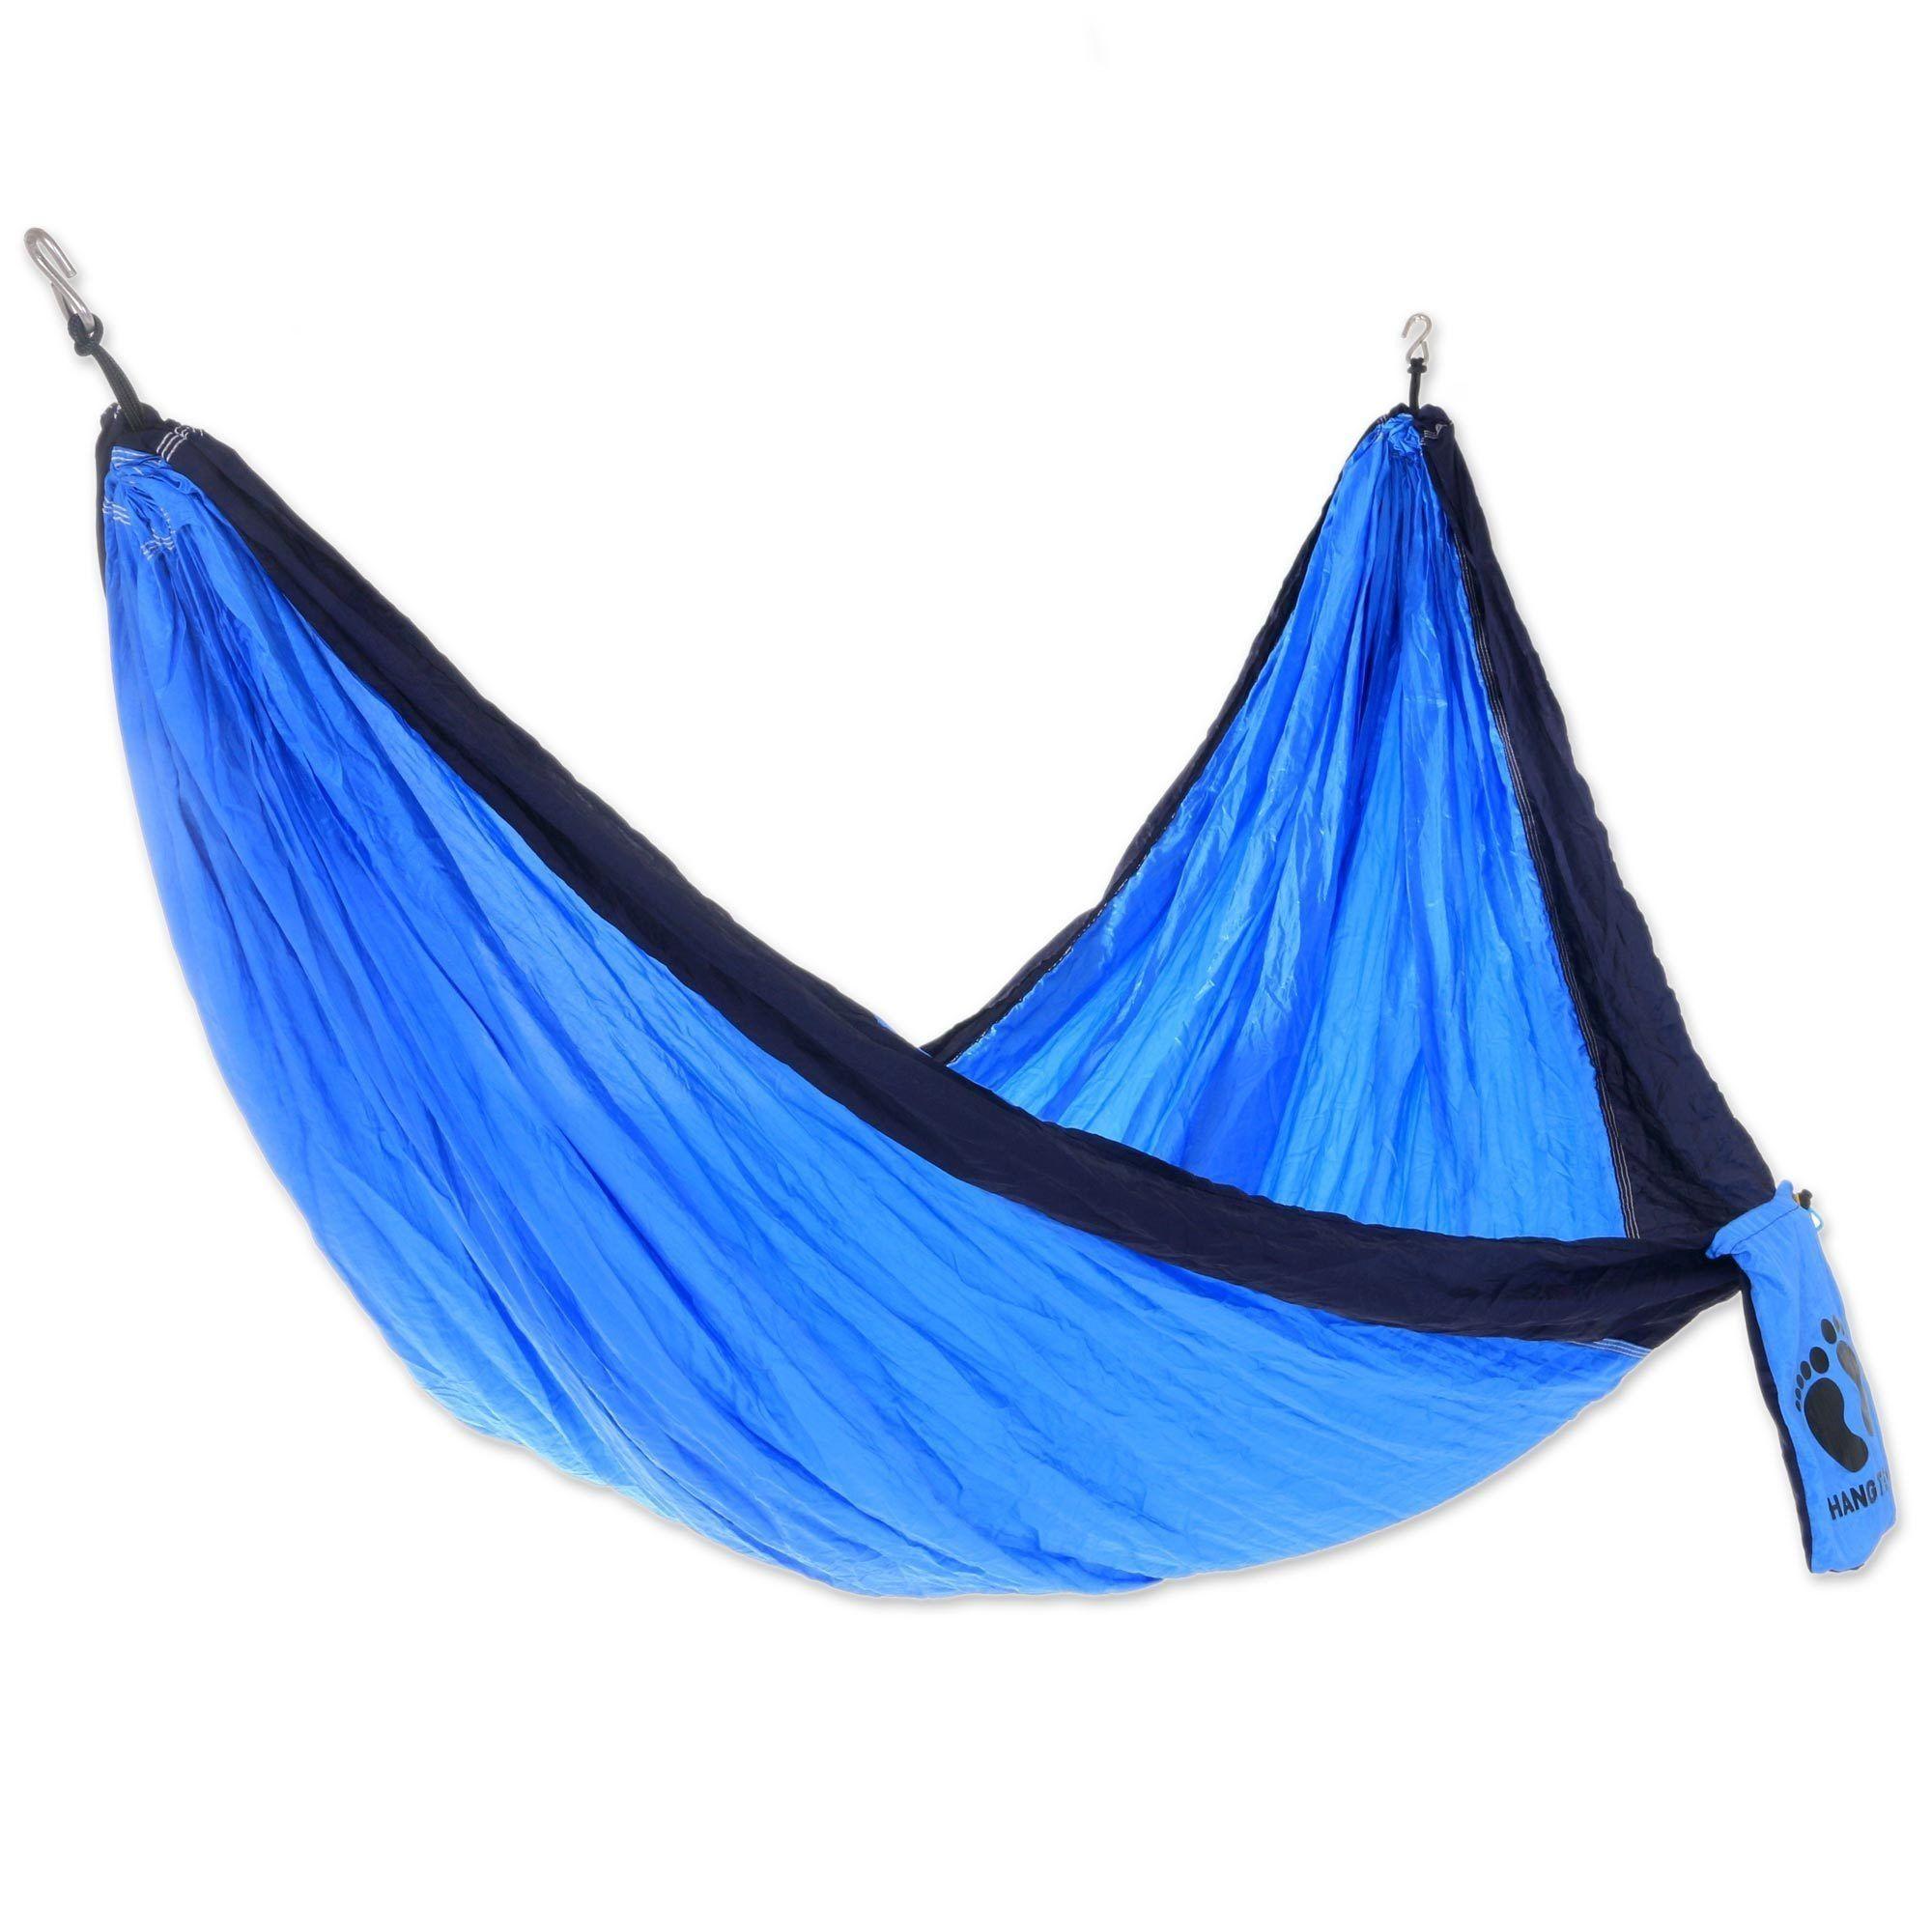 Novica parachute hammock uwave wrangler for hang tenu products